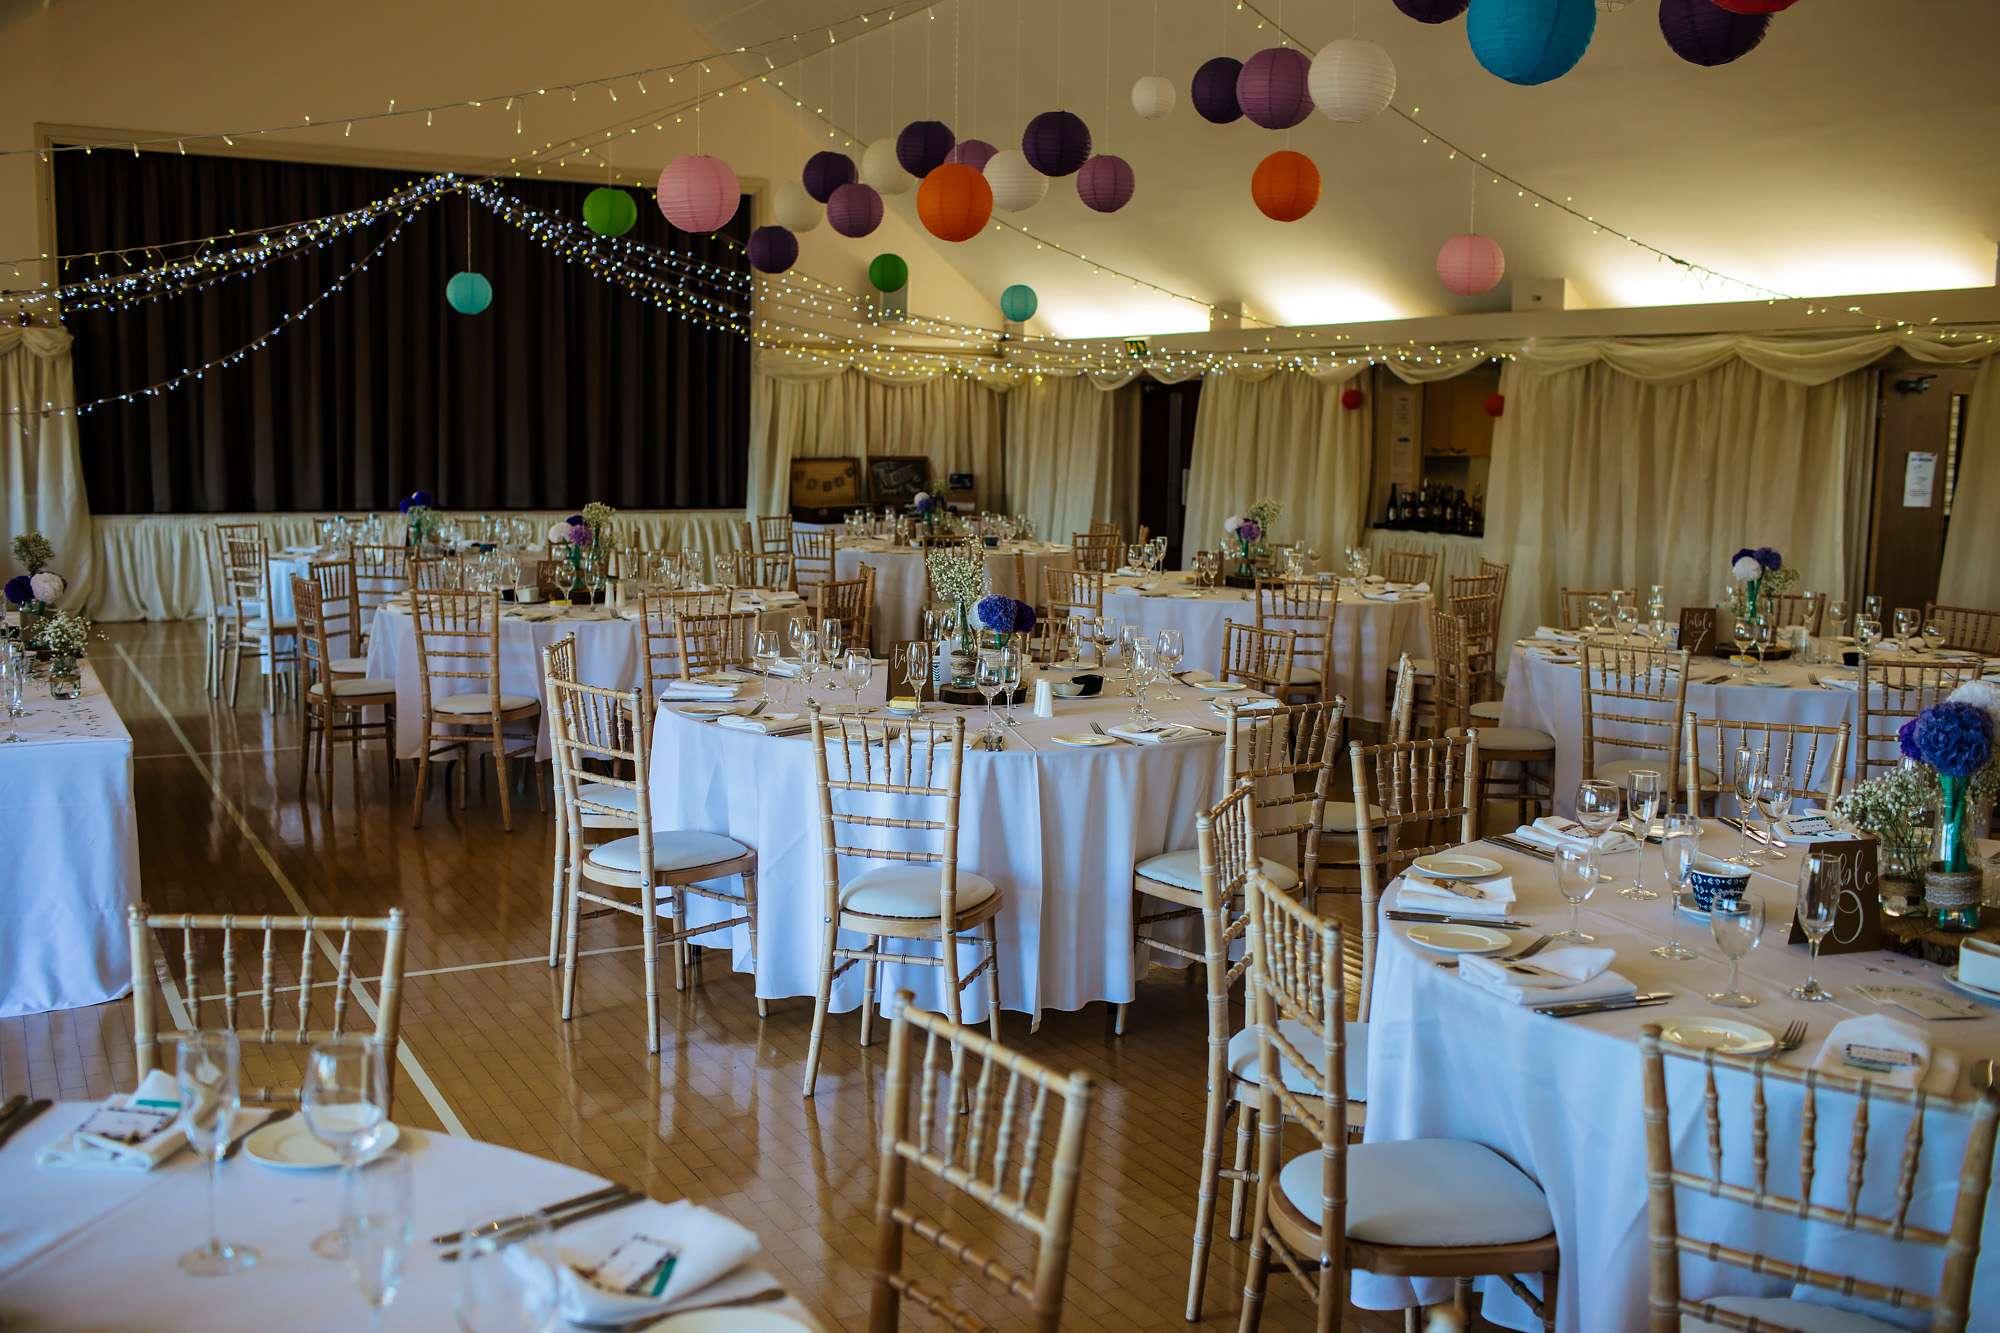 Gorgeous wedding set up at a Leeds venue